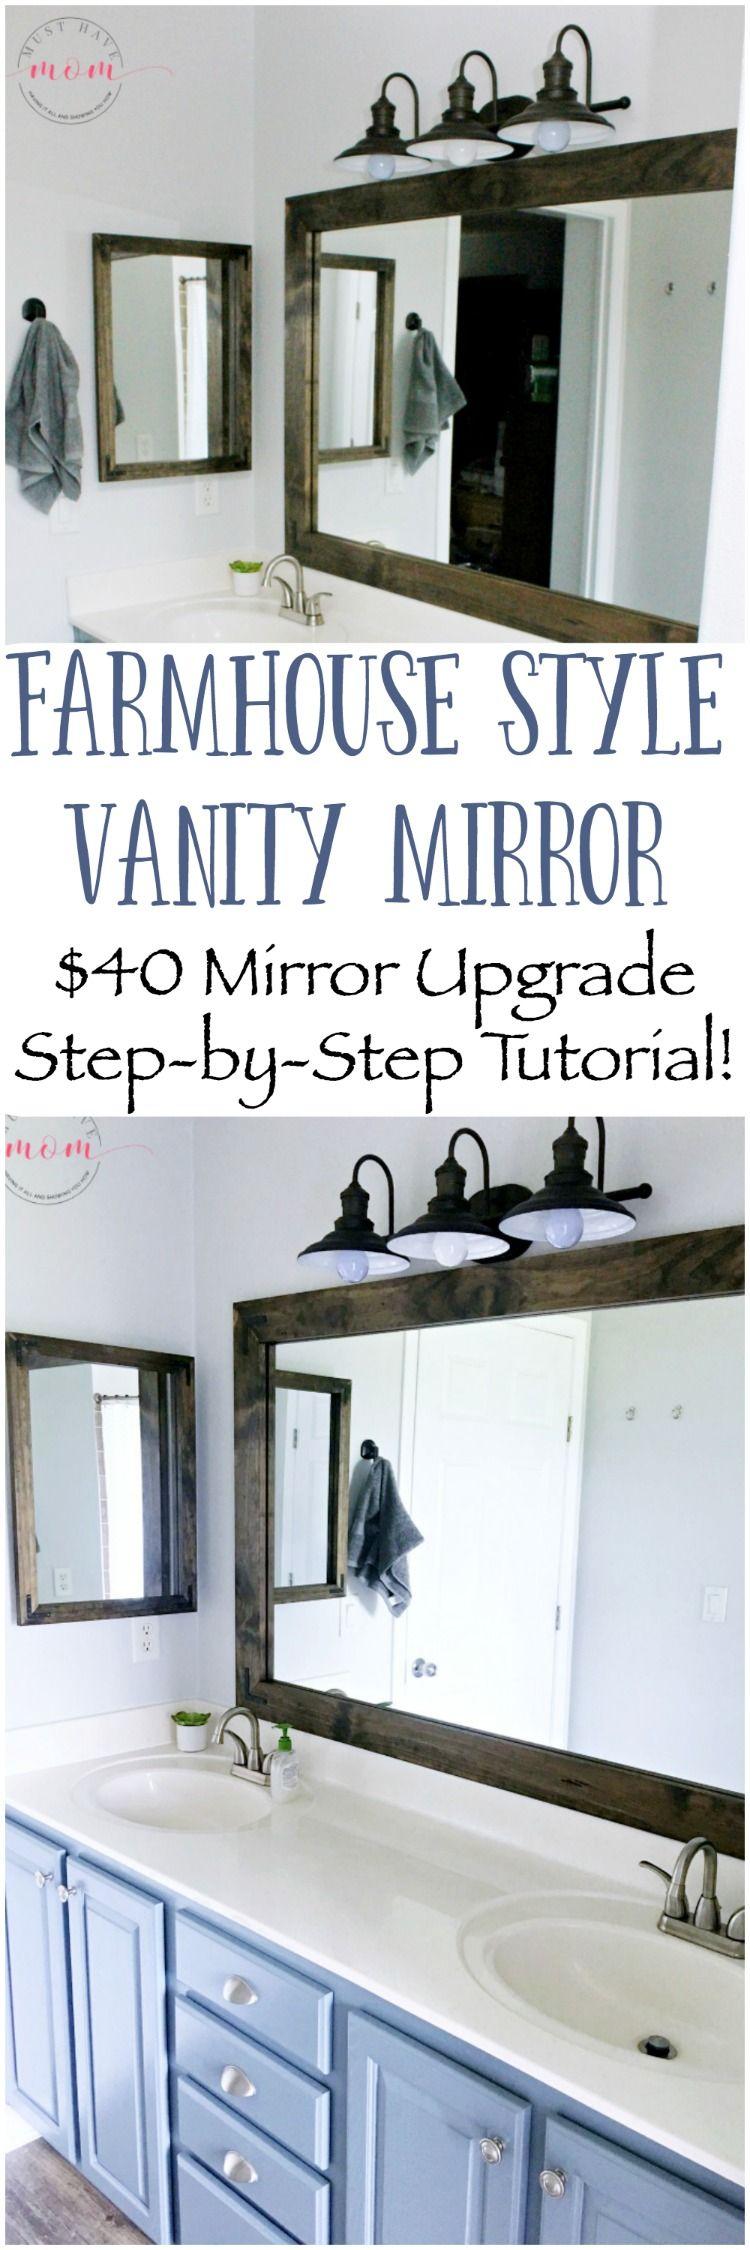 DIY vanity mirrors! Farmhouse style bathroom vanity mirror